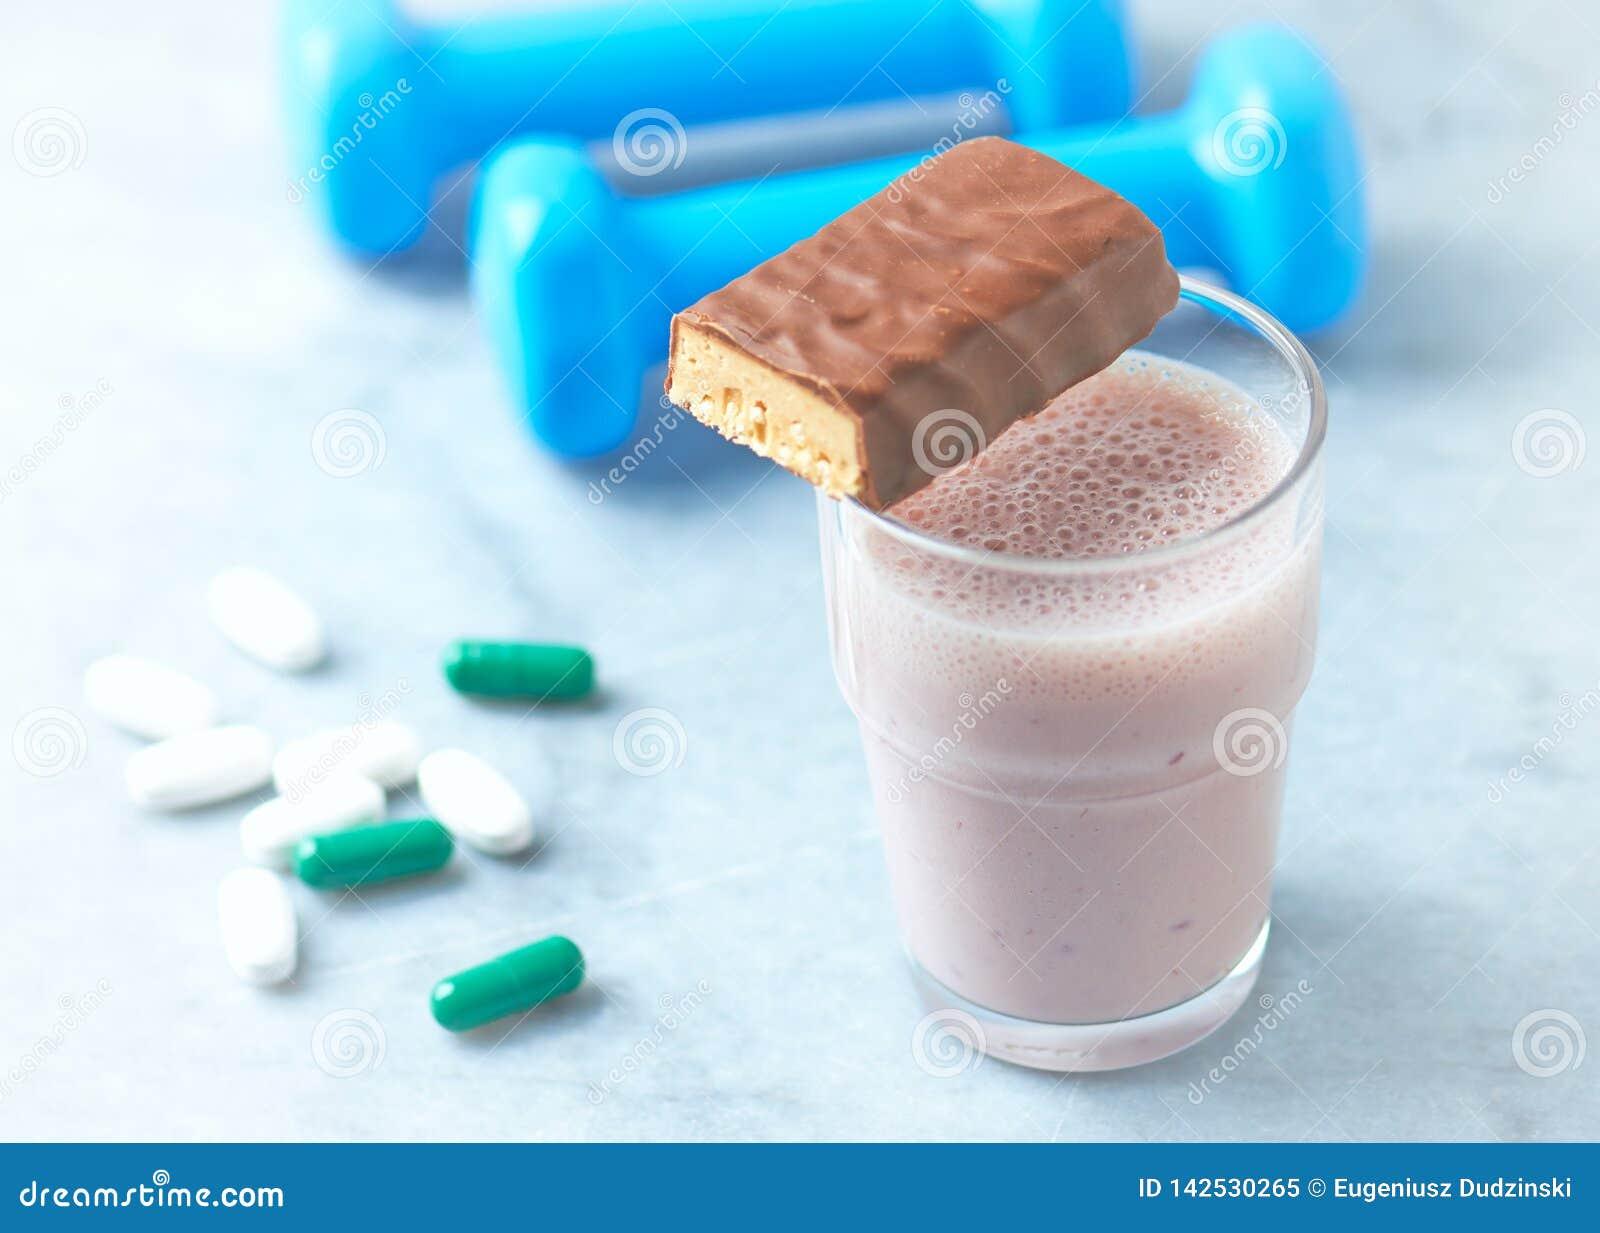 Eiwitbar, glas van eiwitschok met melk en frambozen BCAA-aminozuren, L - Carnitine capsules en blauwe domoren in rug